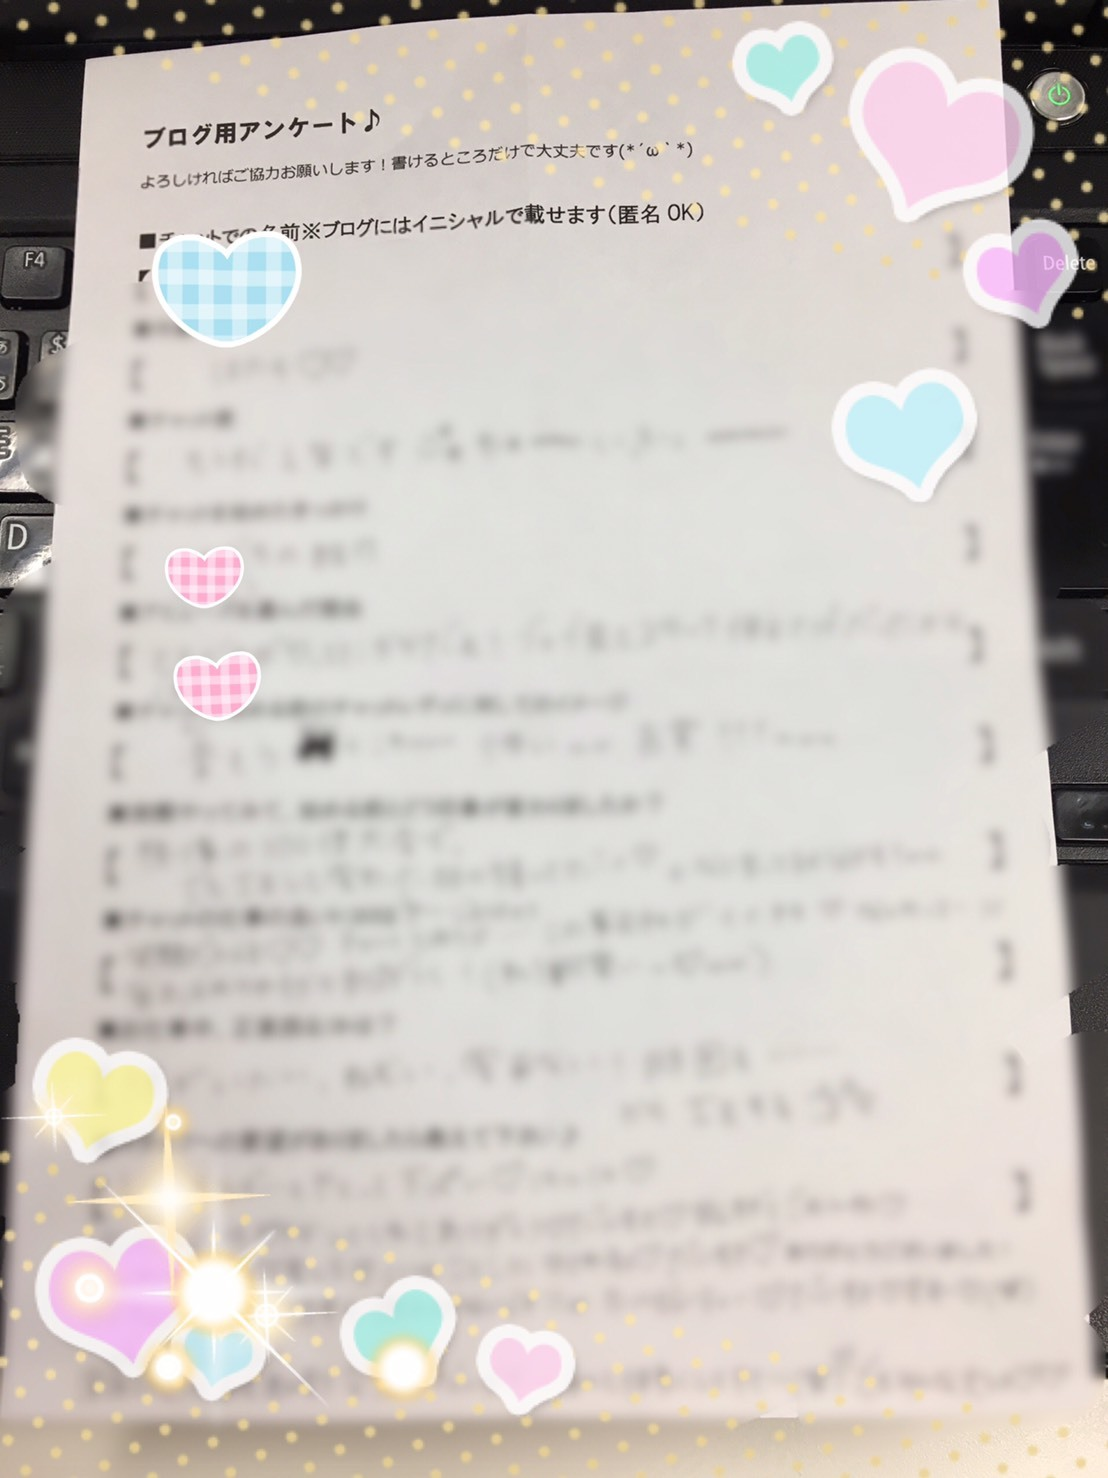 S__25165826.jpg